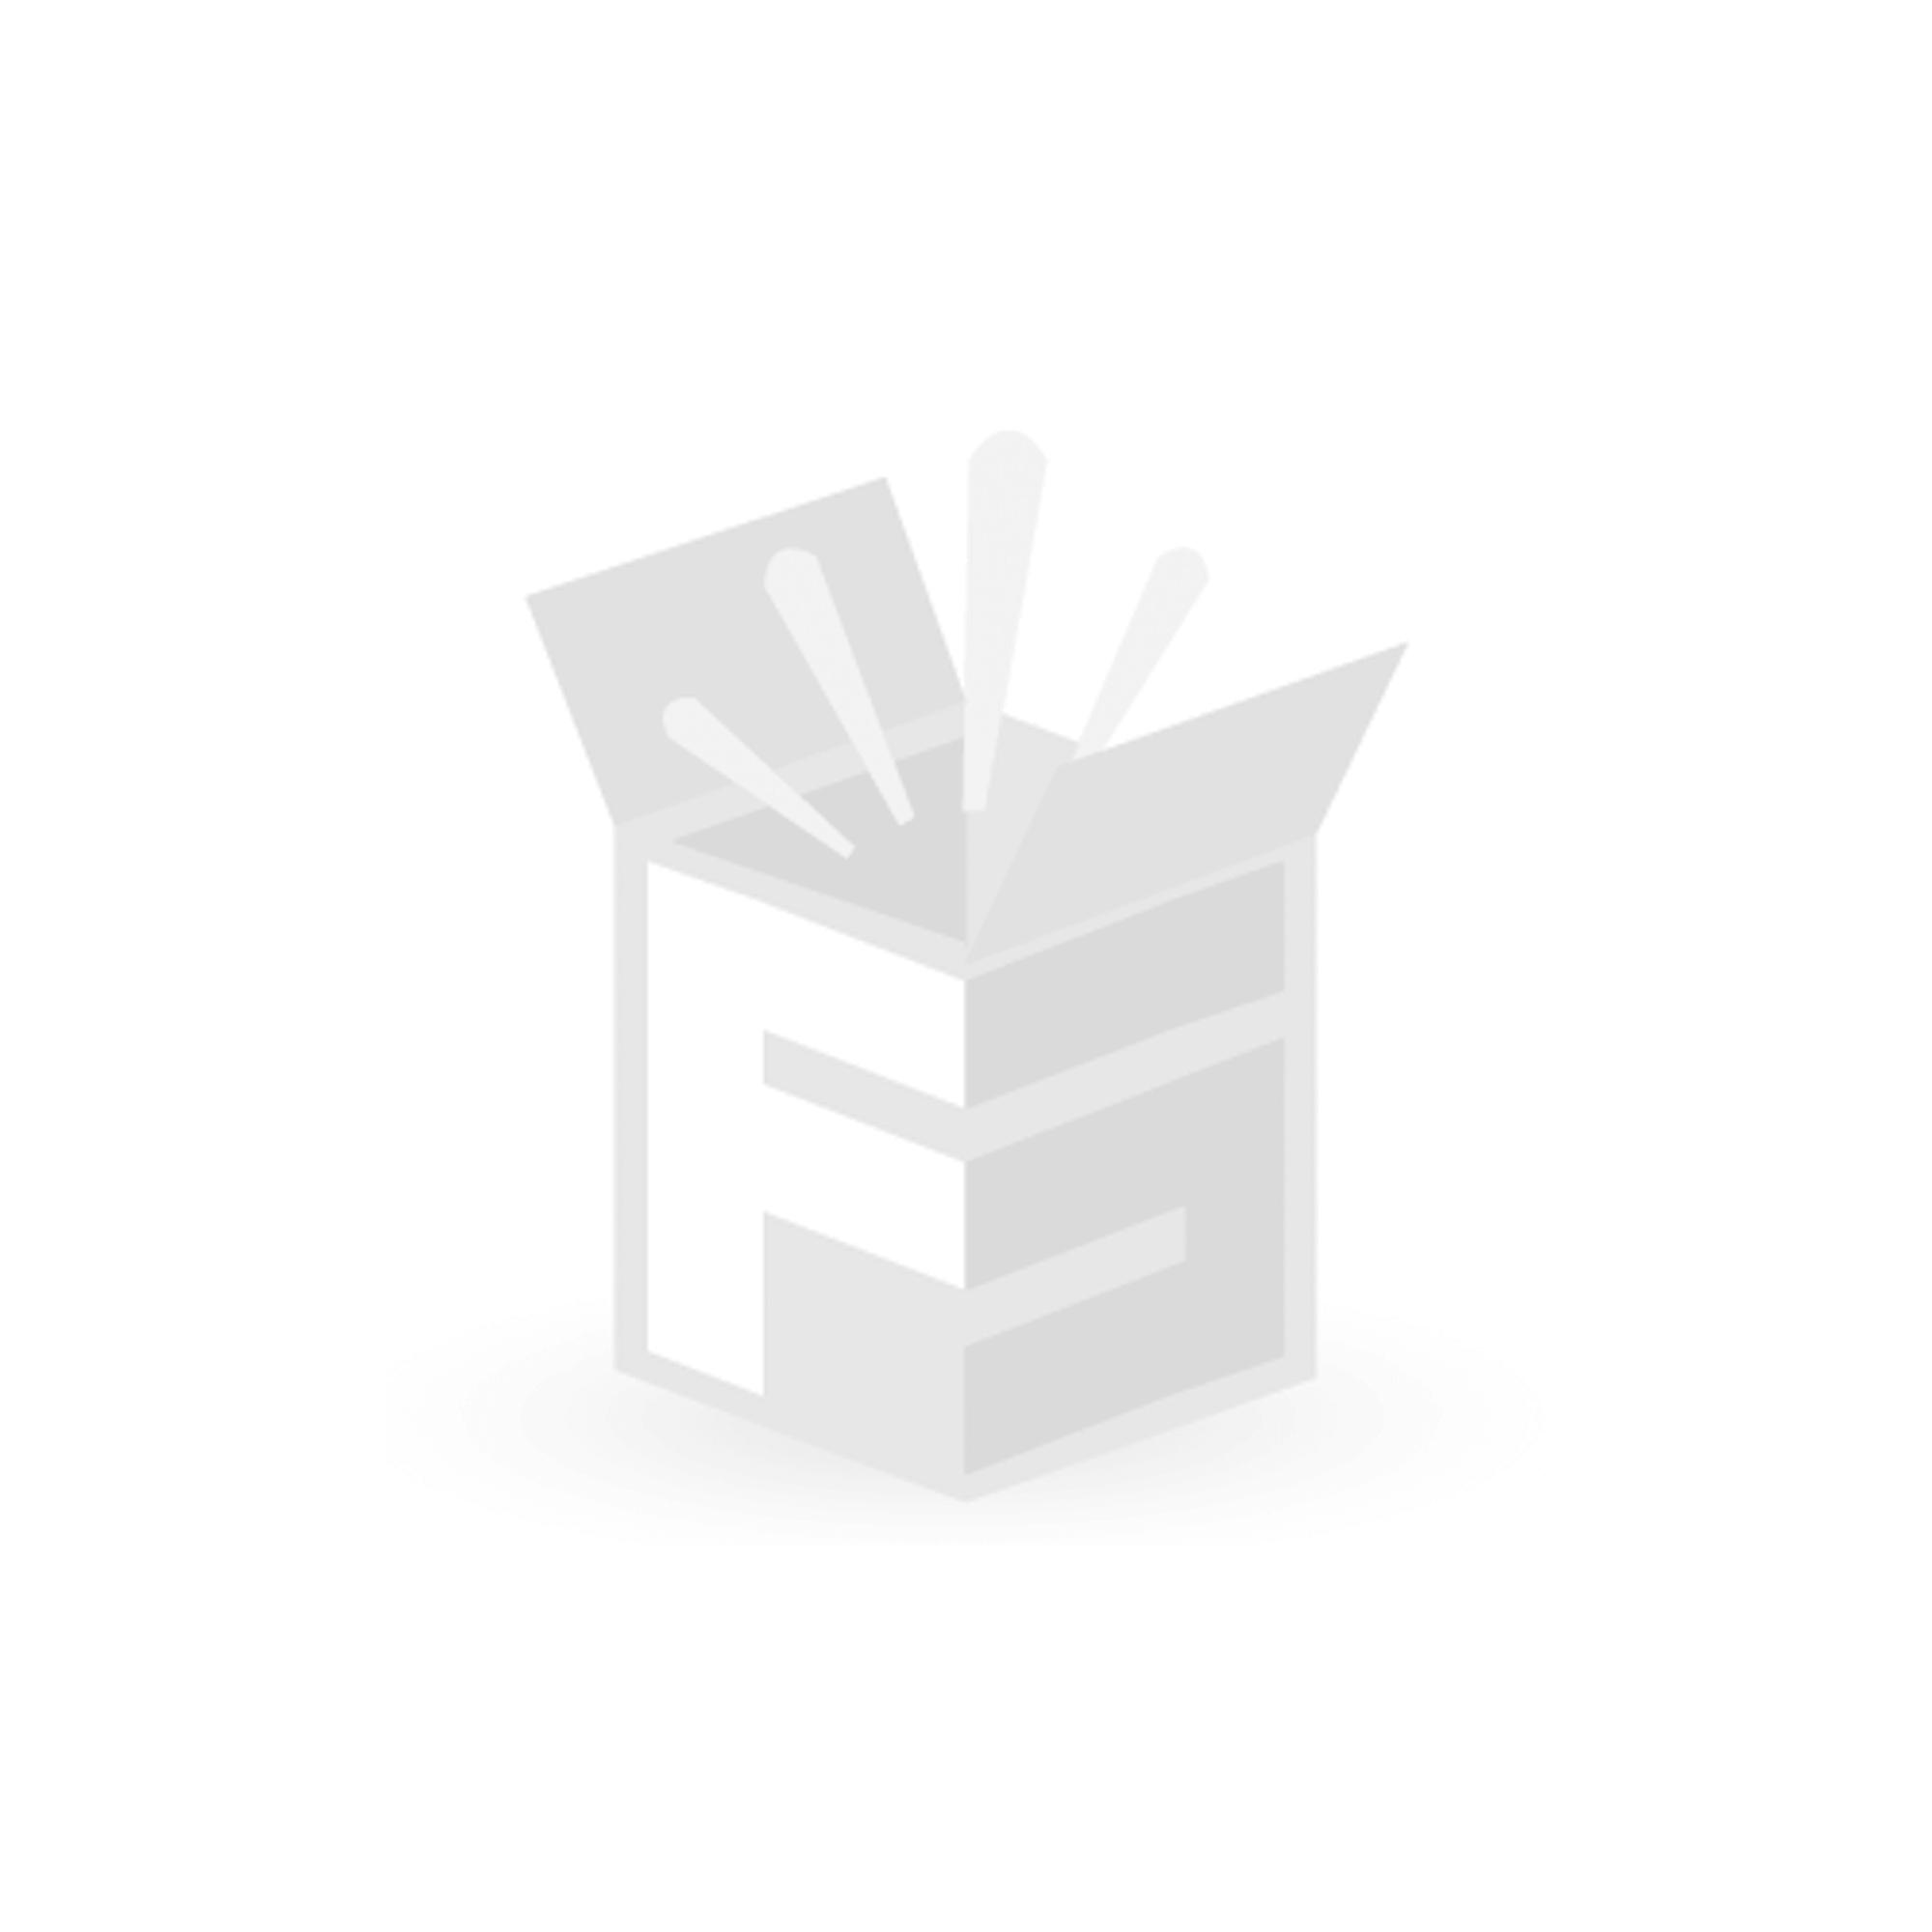 Kibernetik Werkzeugkoffer fahrbar 136-teilig